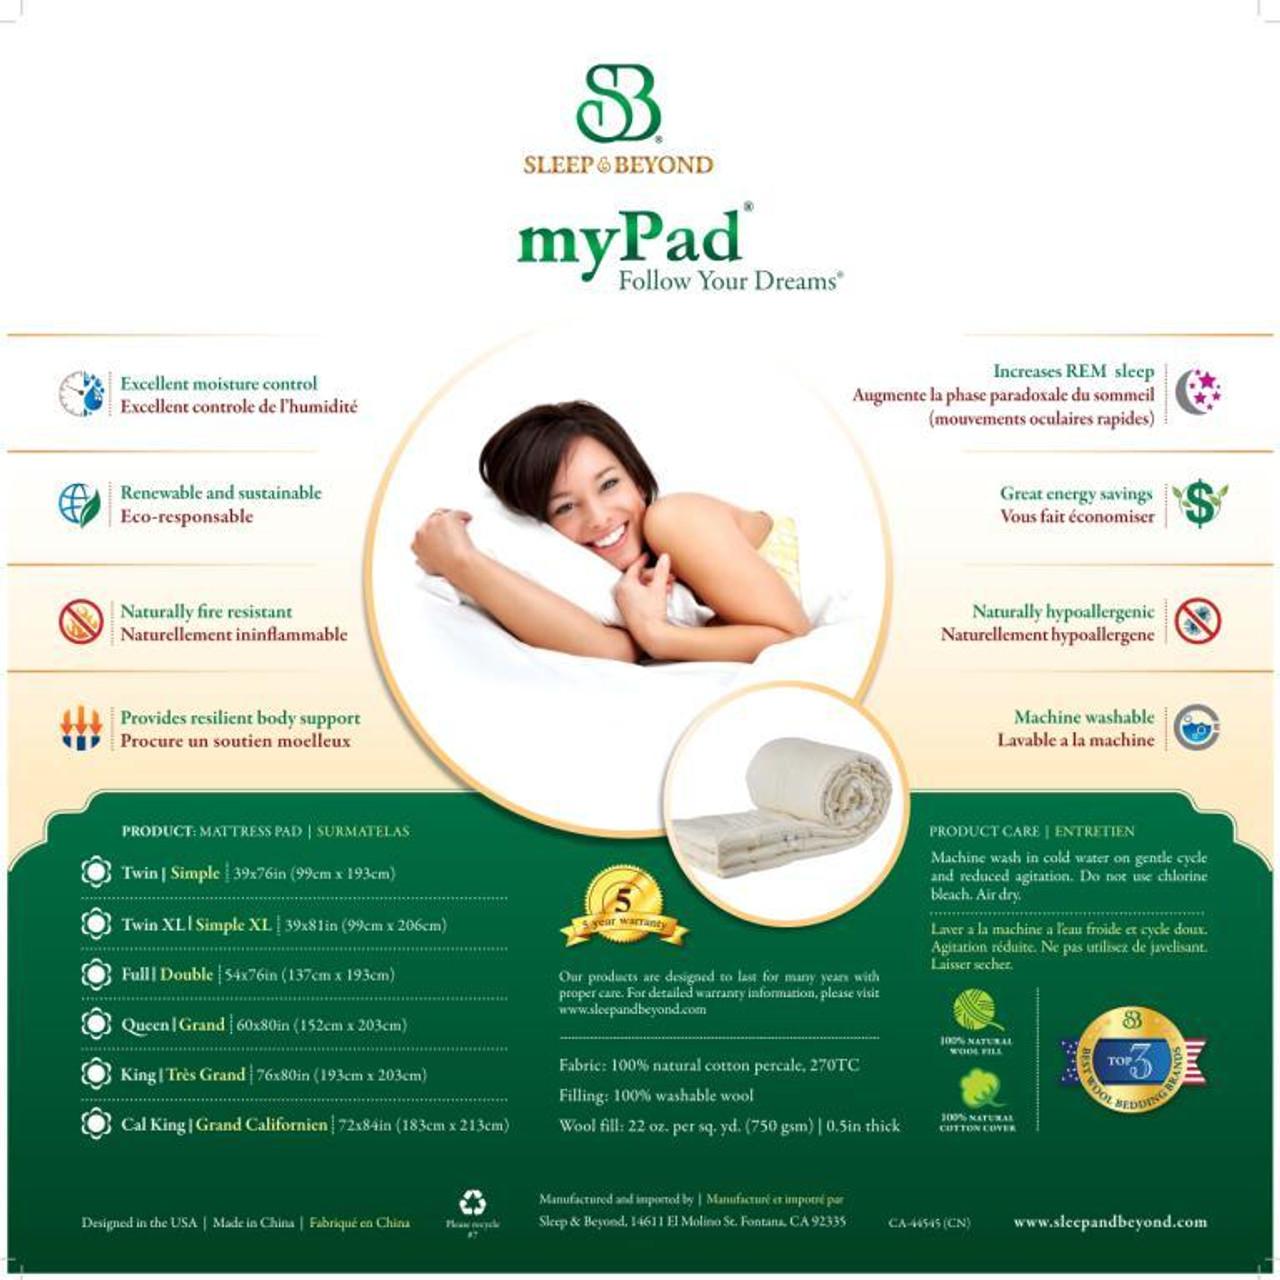 Sleep & Beyond myPad 100% Washable Wool Mattress Pad Back Package